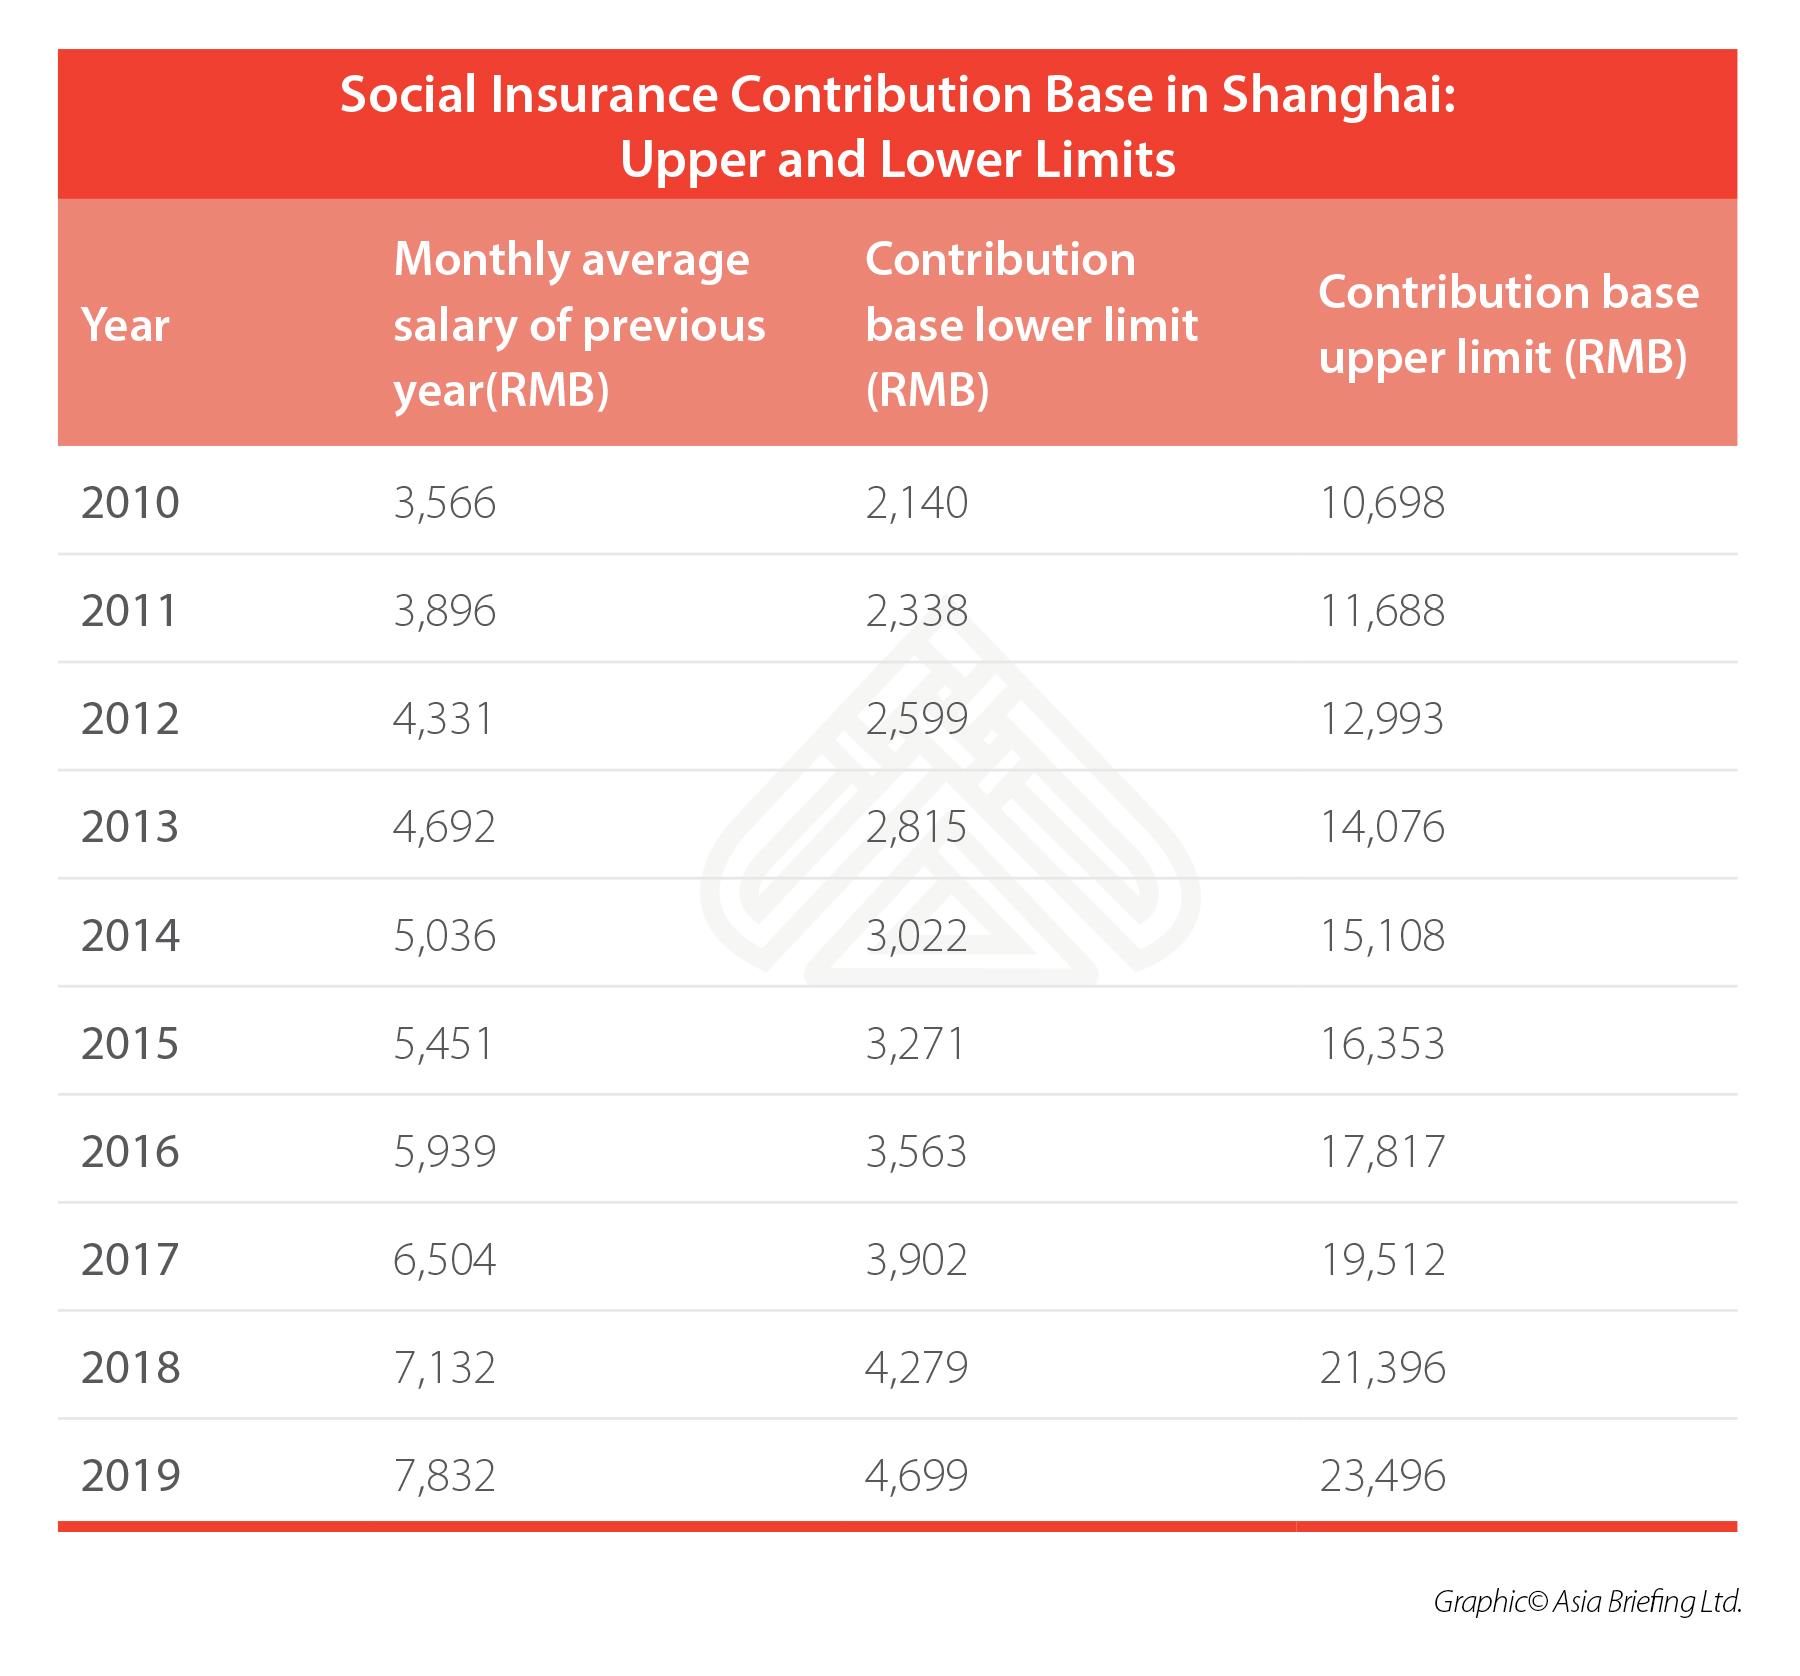 Shanghai's social contribution base